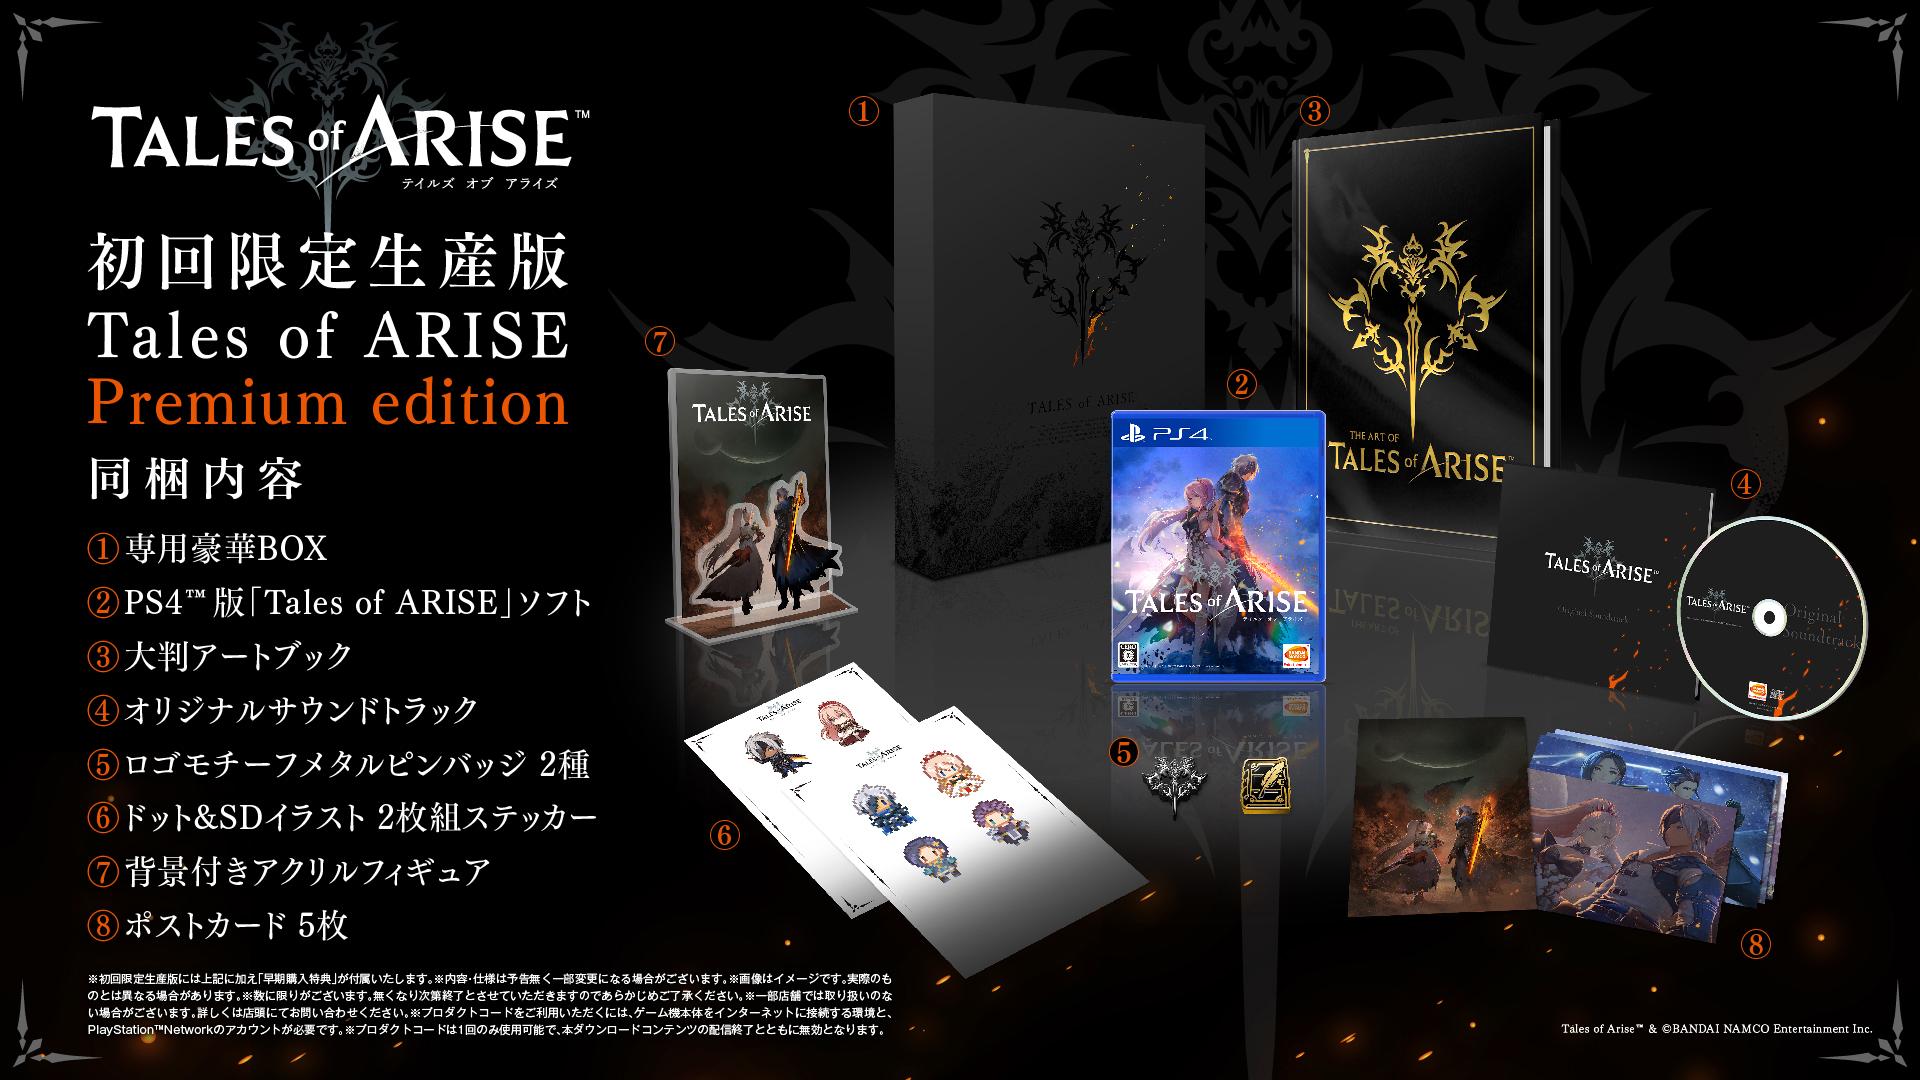 PS4版『Tales of ARISE』Premium edition 電撃スペシャルパック